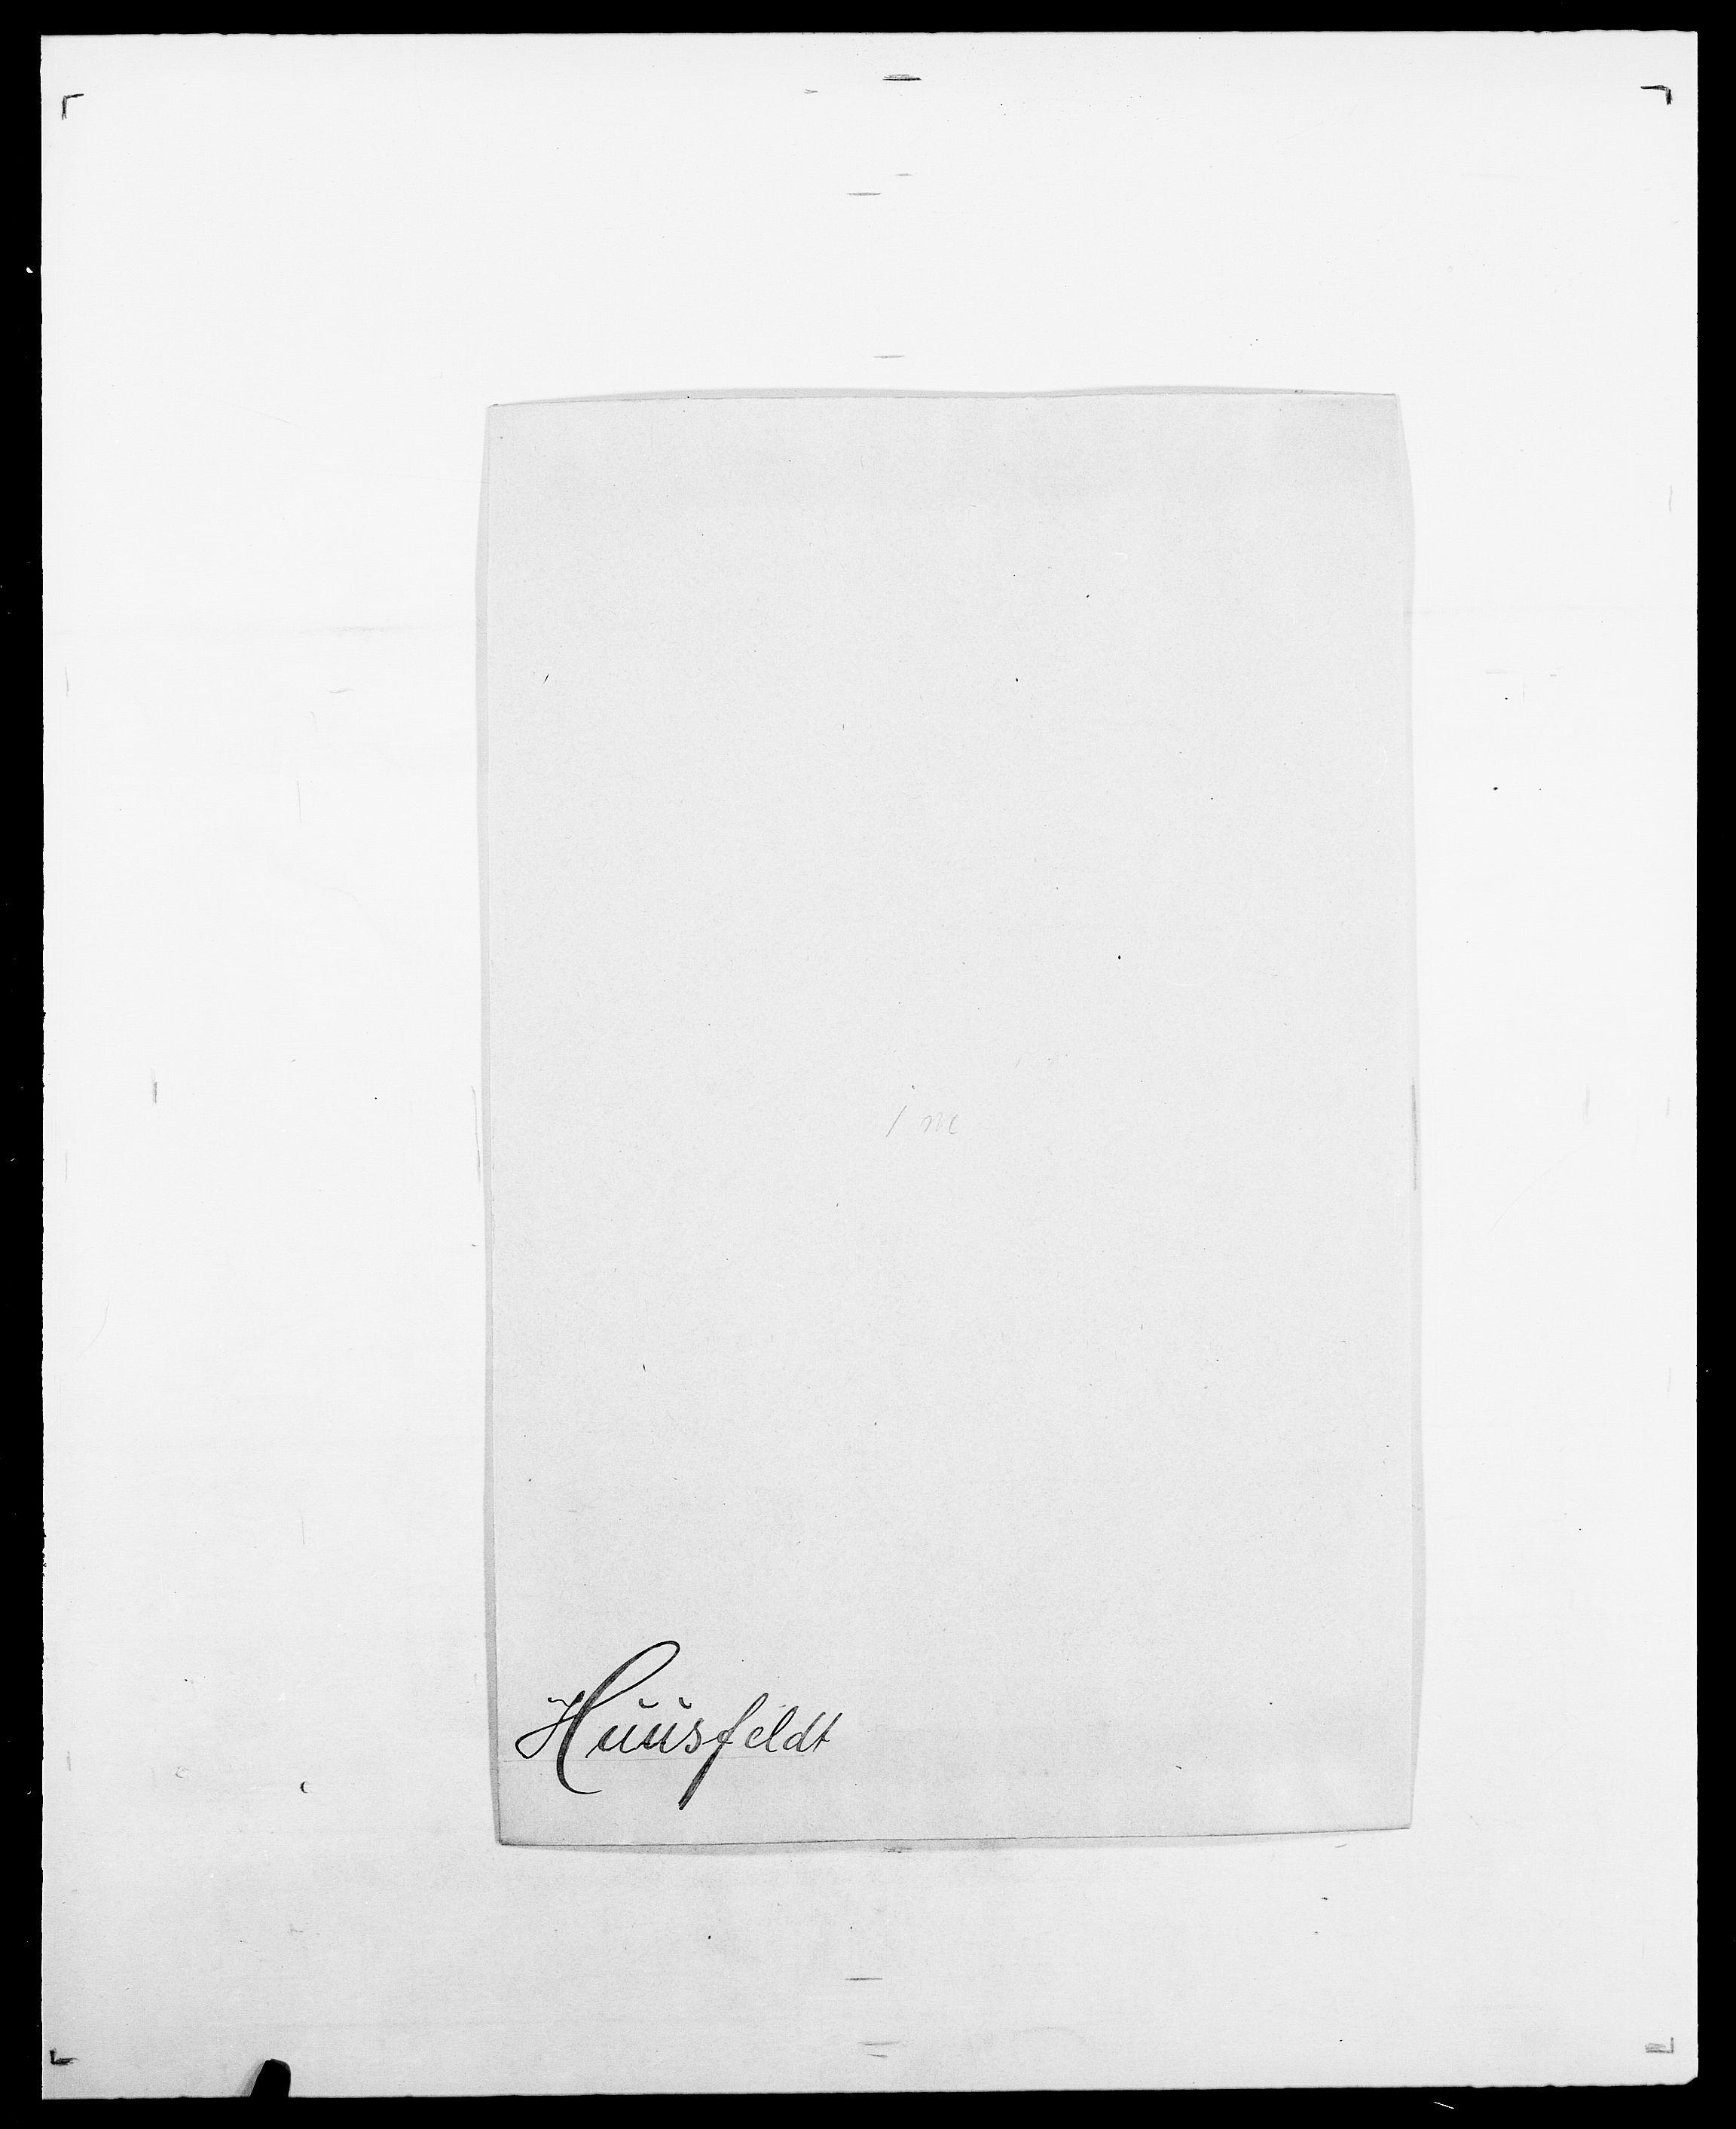 SAO, Delgobe, Charles Antoine - samling, D/Da/L0019: van der Hude - Joys, s. 106